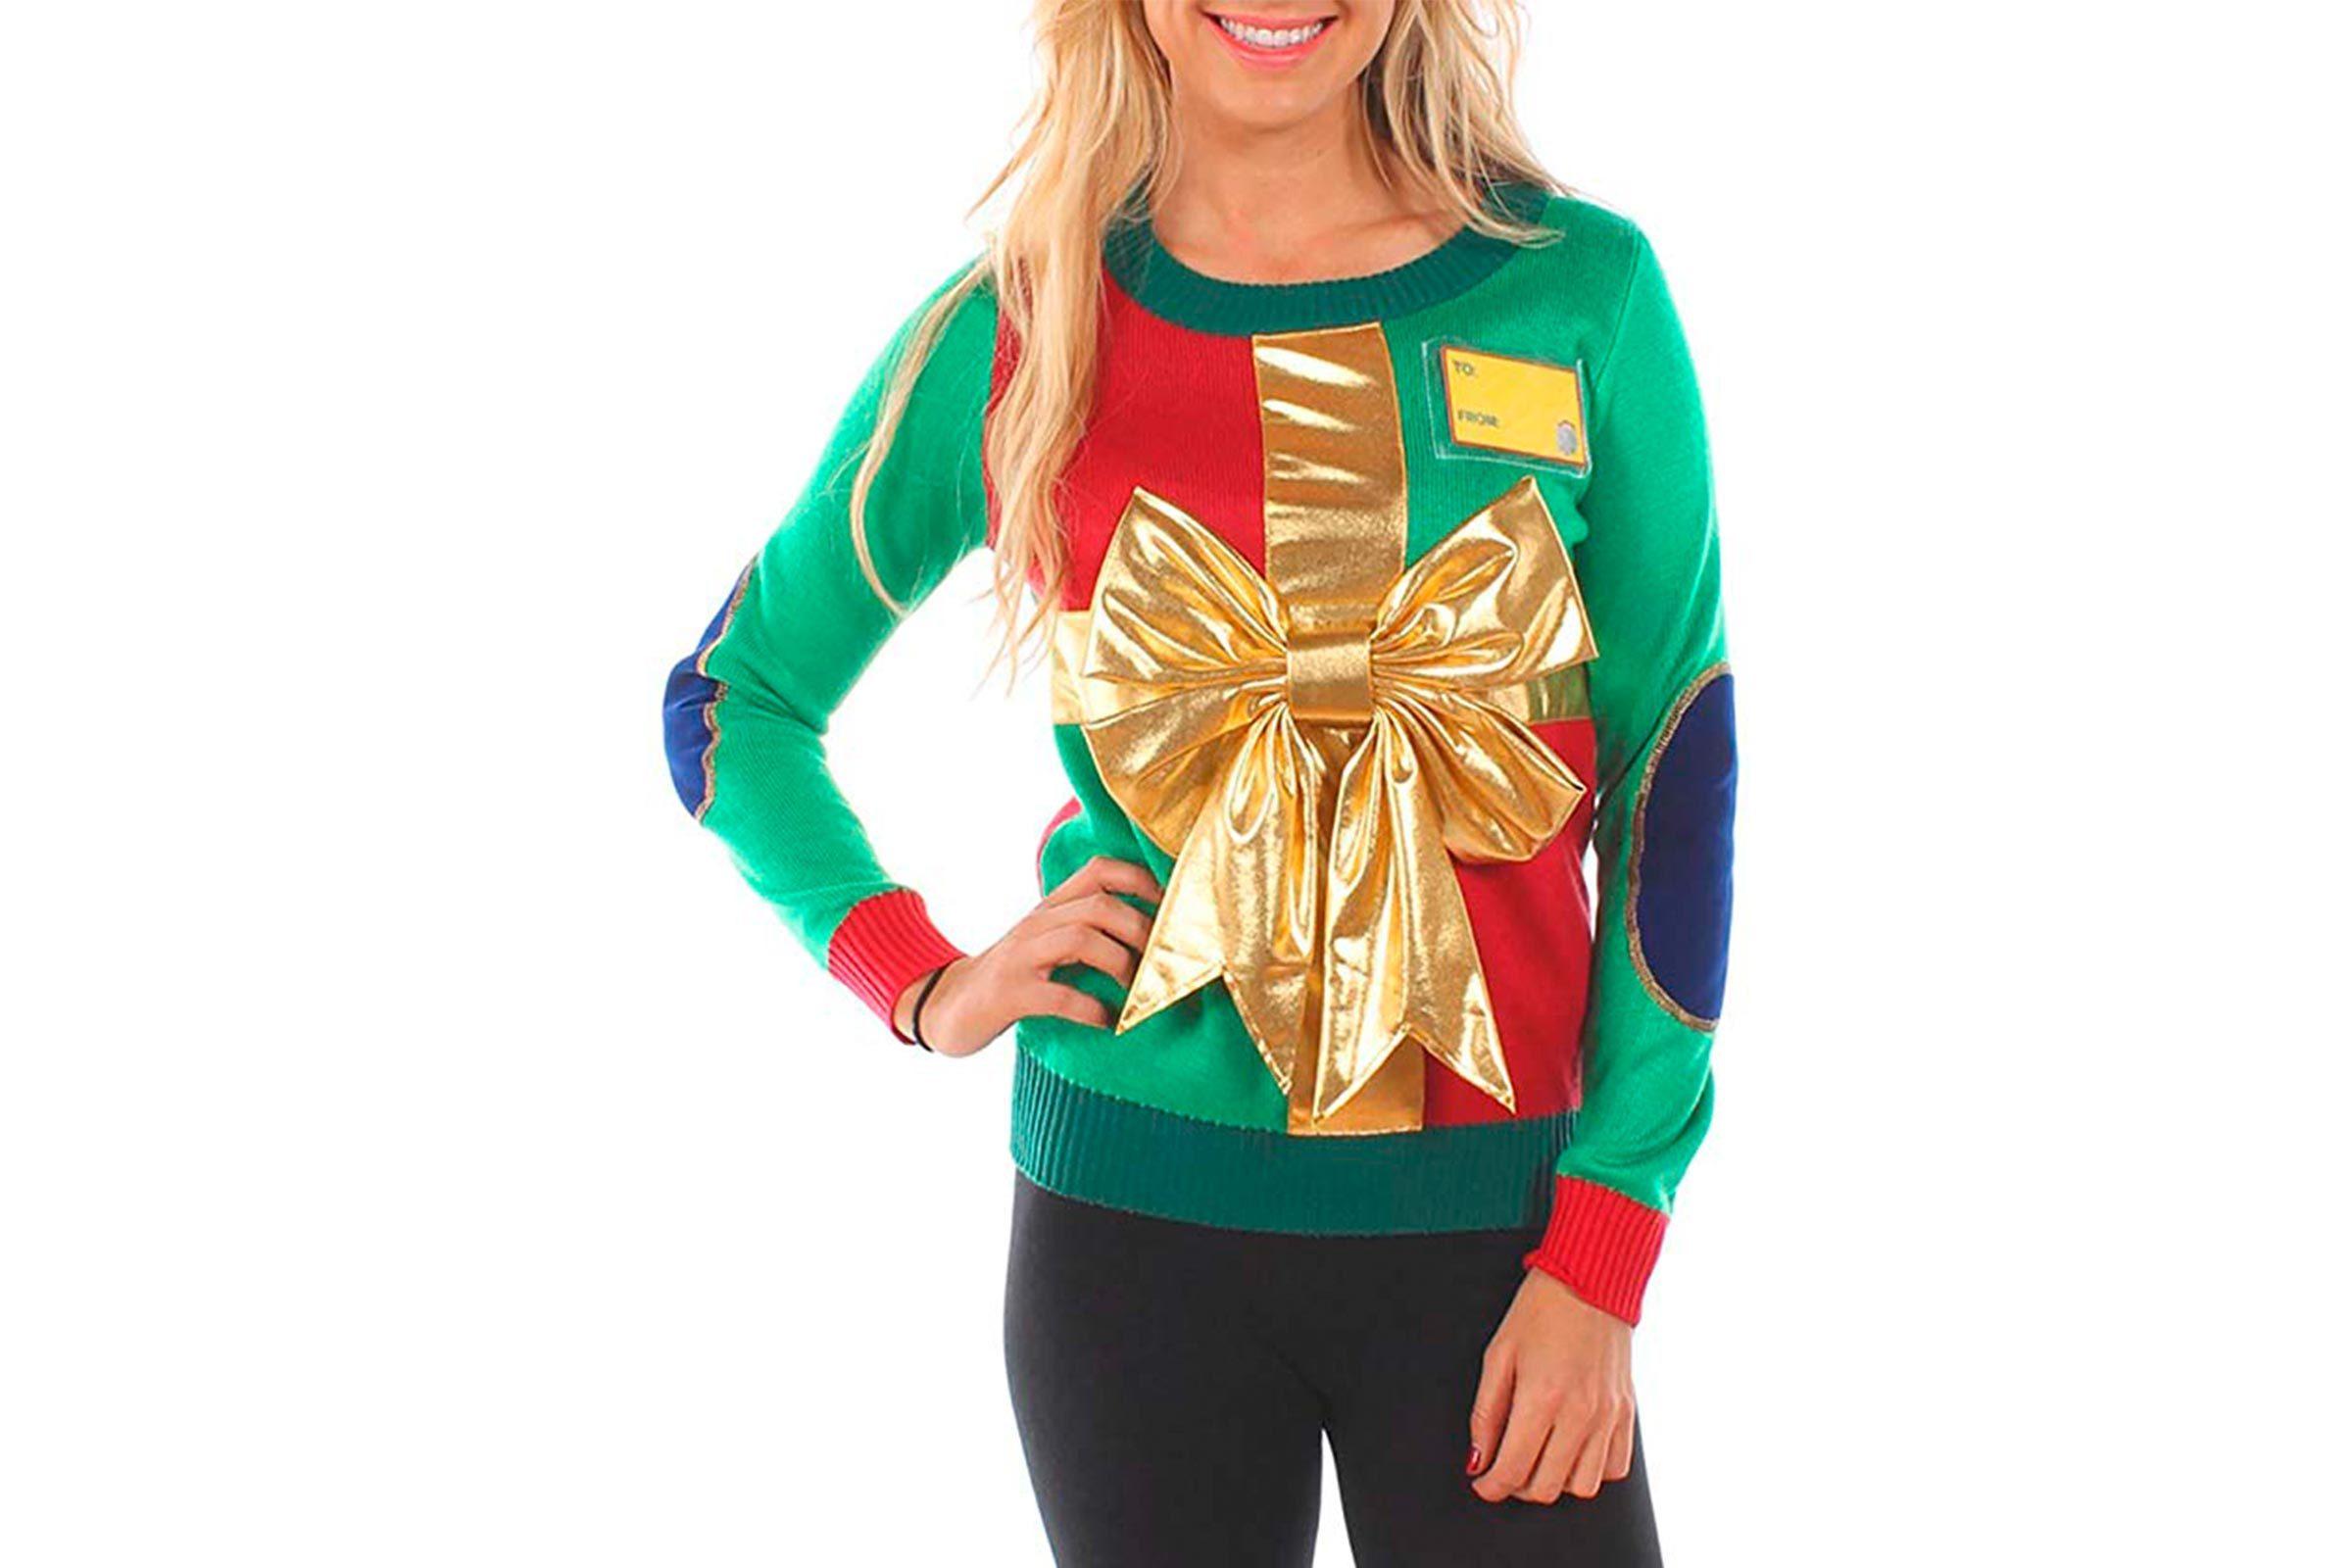 Present Christmas sweater